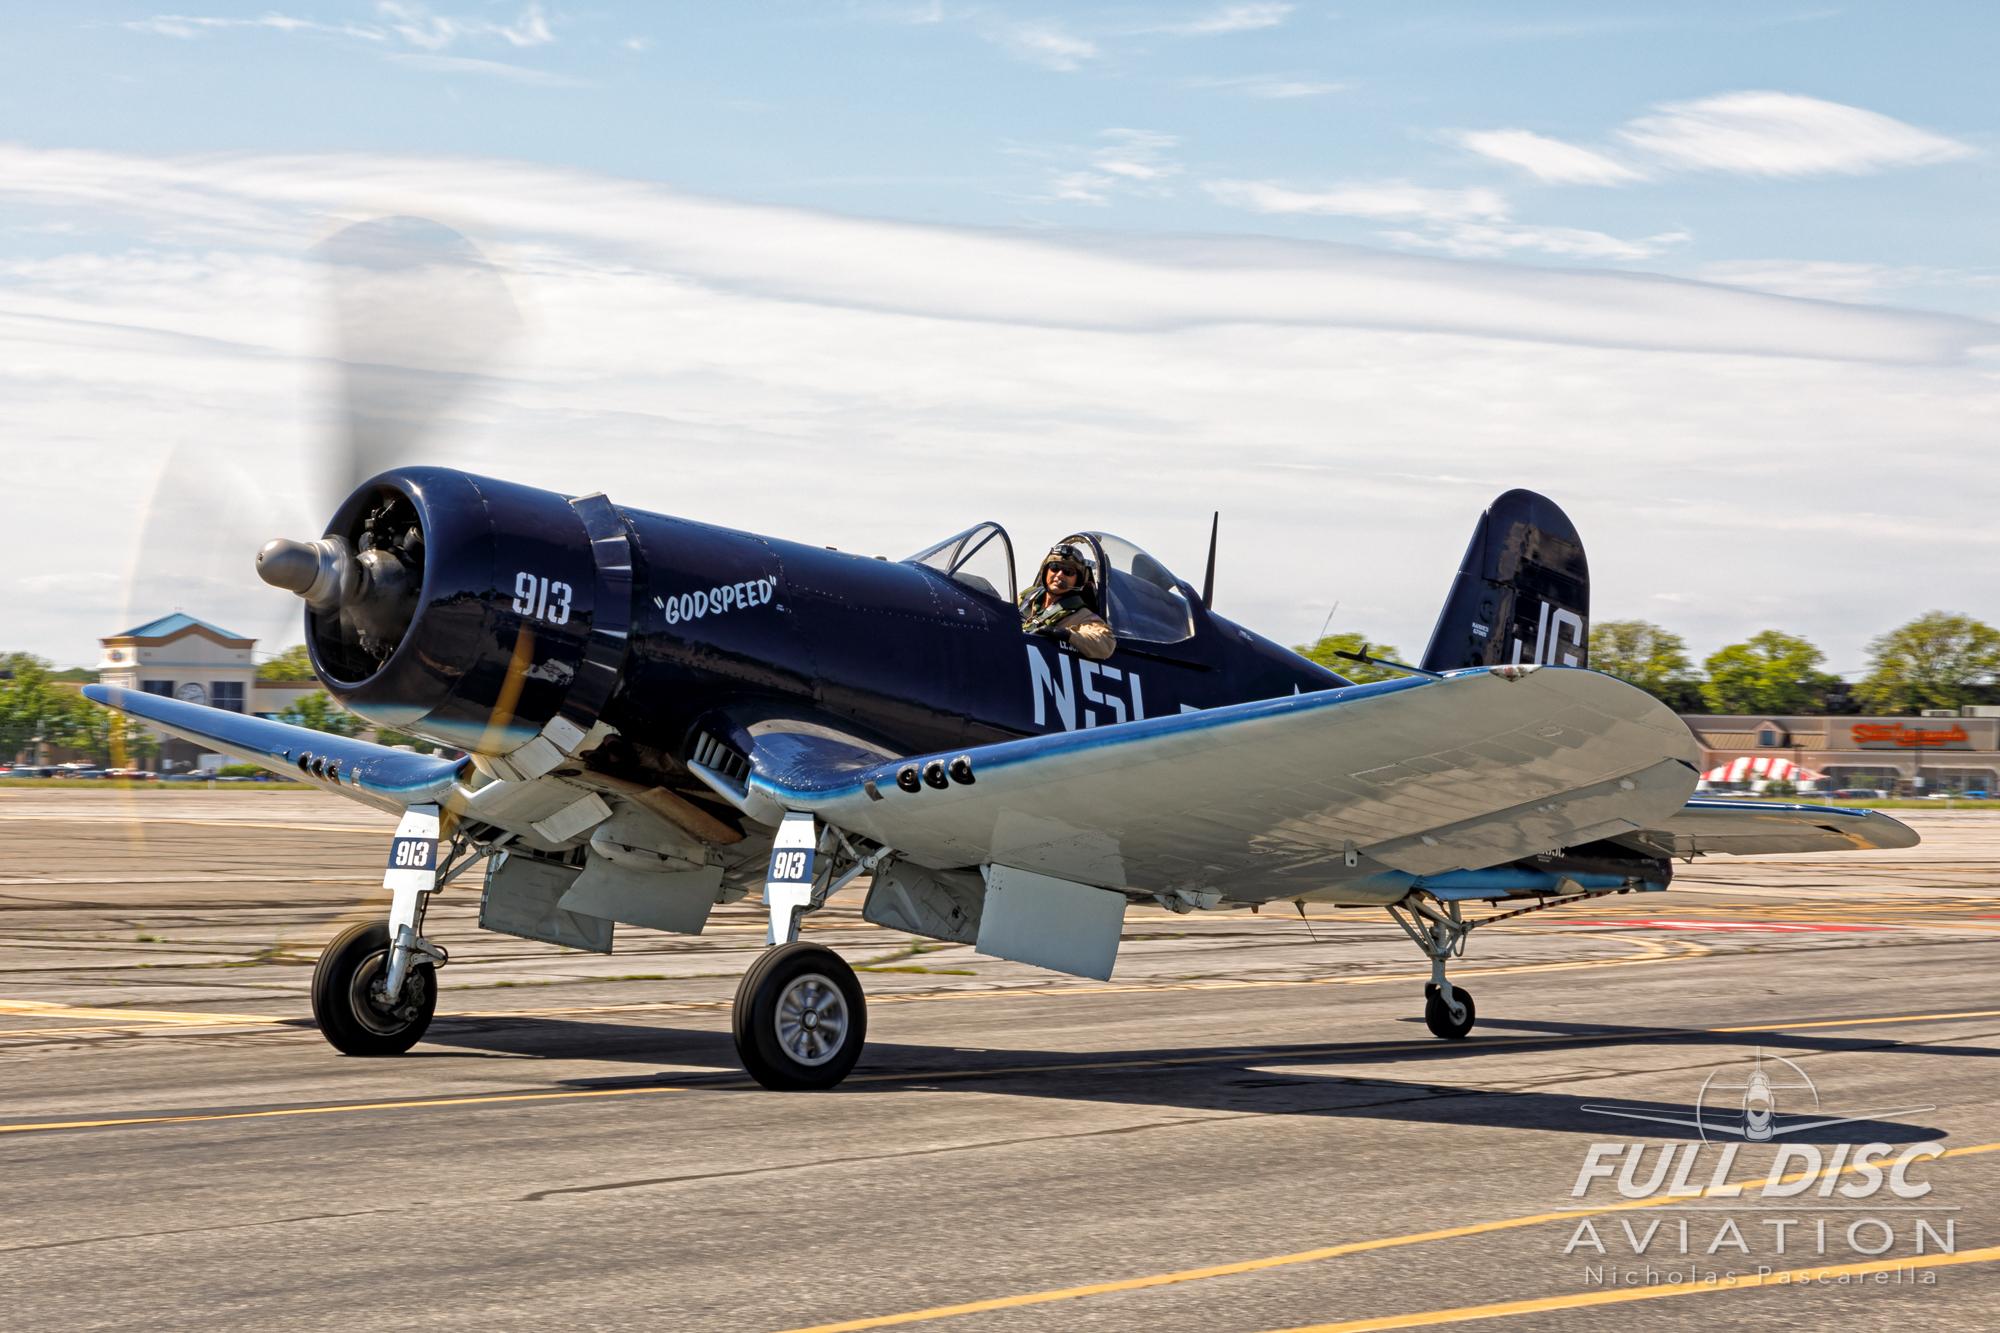 americanairpowermuseum_nicholaspascarella_nickpascarella_fulldiscaviation_legendsofairpower2019_aviation_warbird_corsair_f4u_godspeed_taxi.jpg